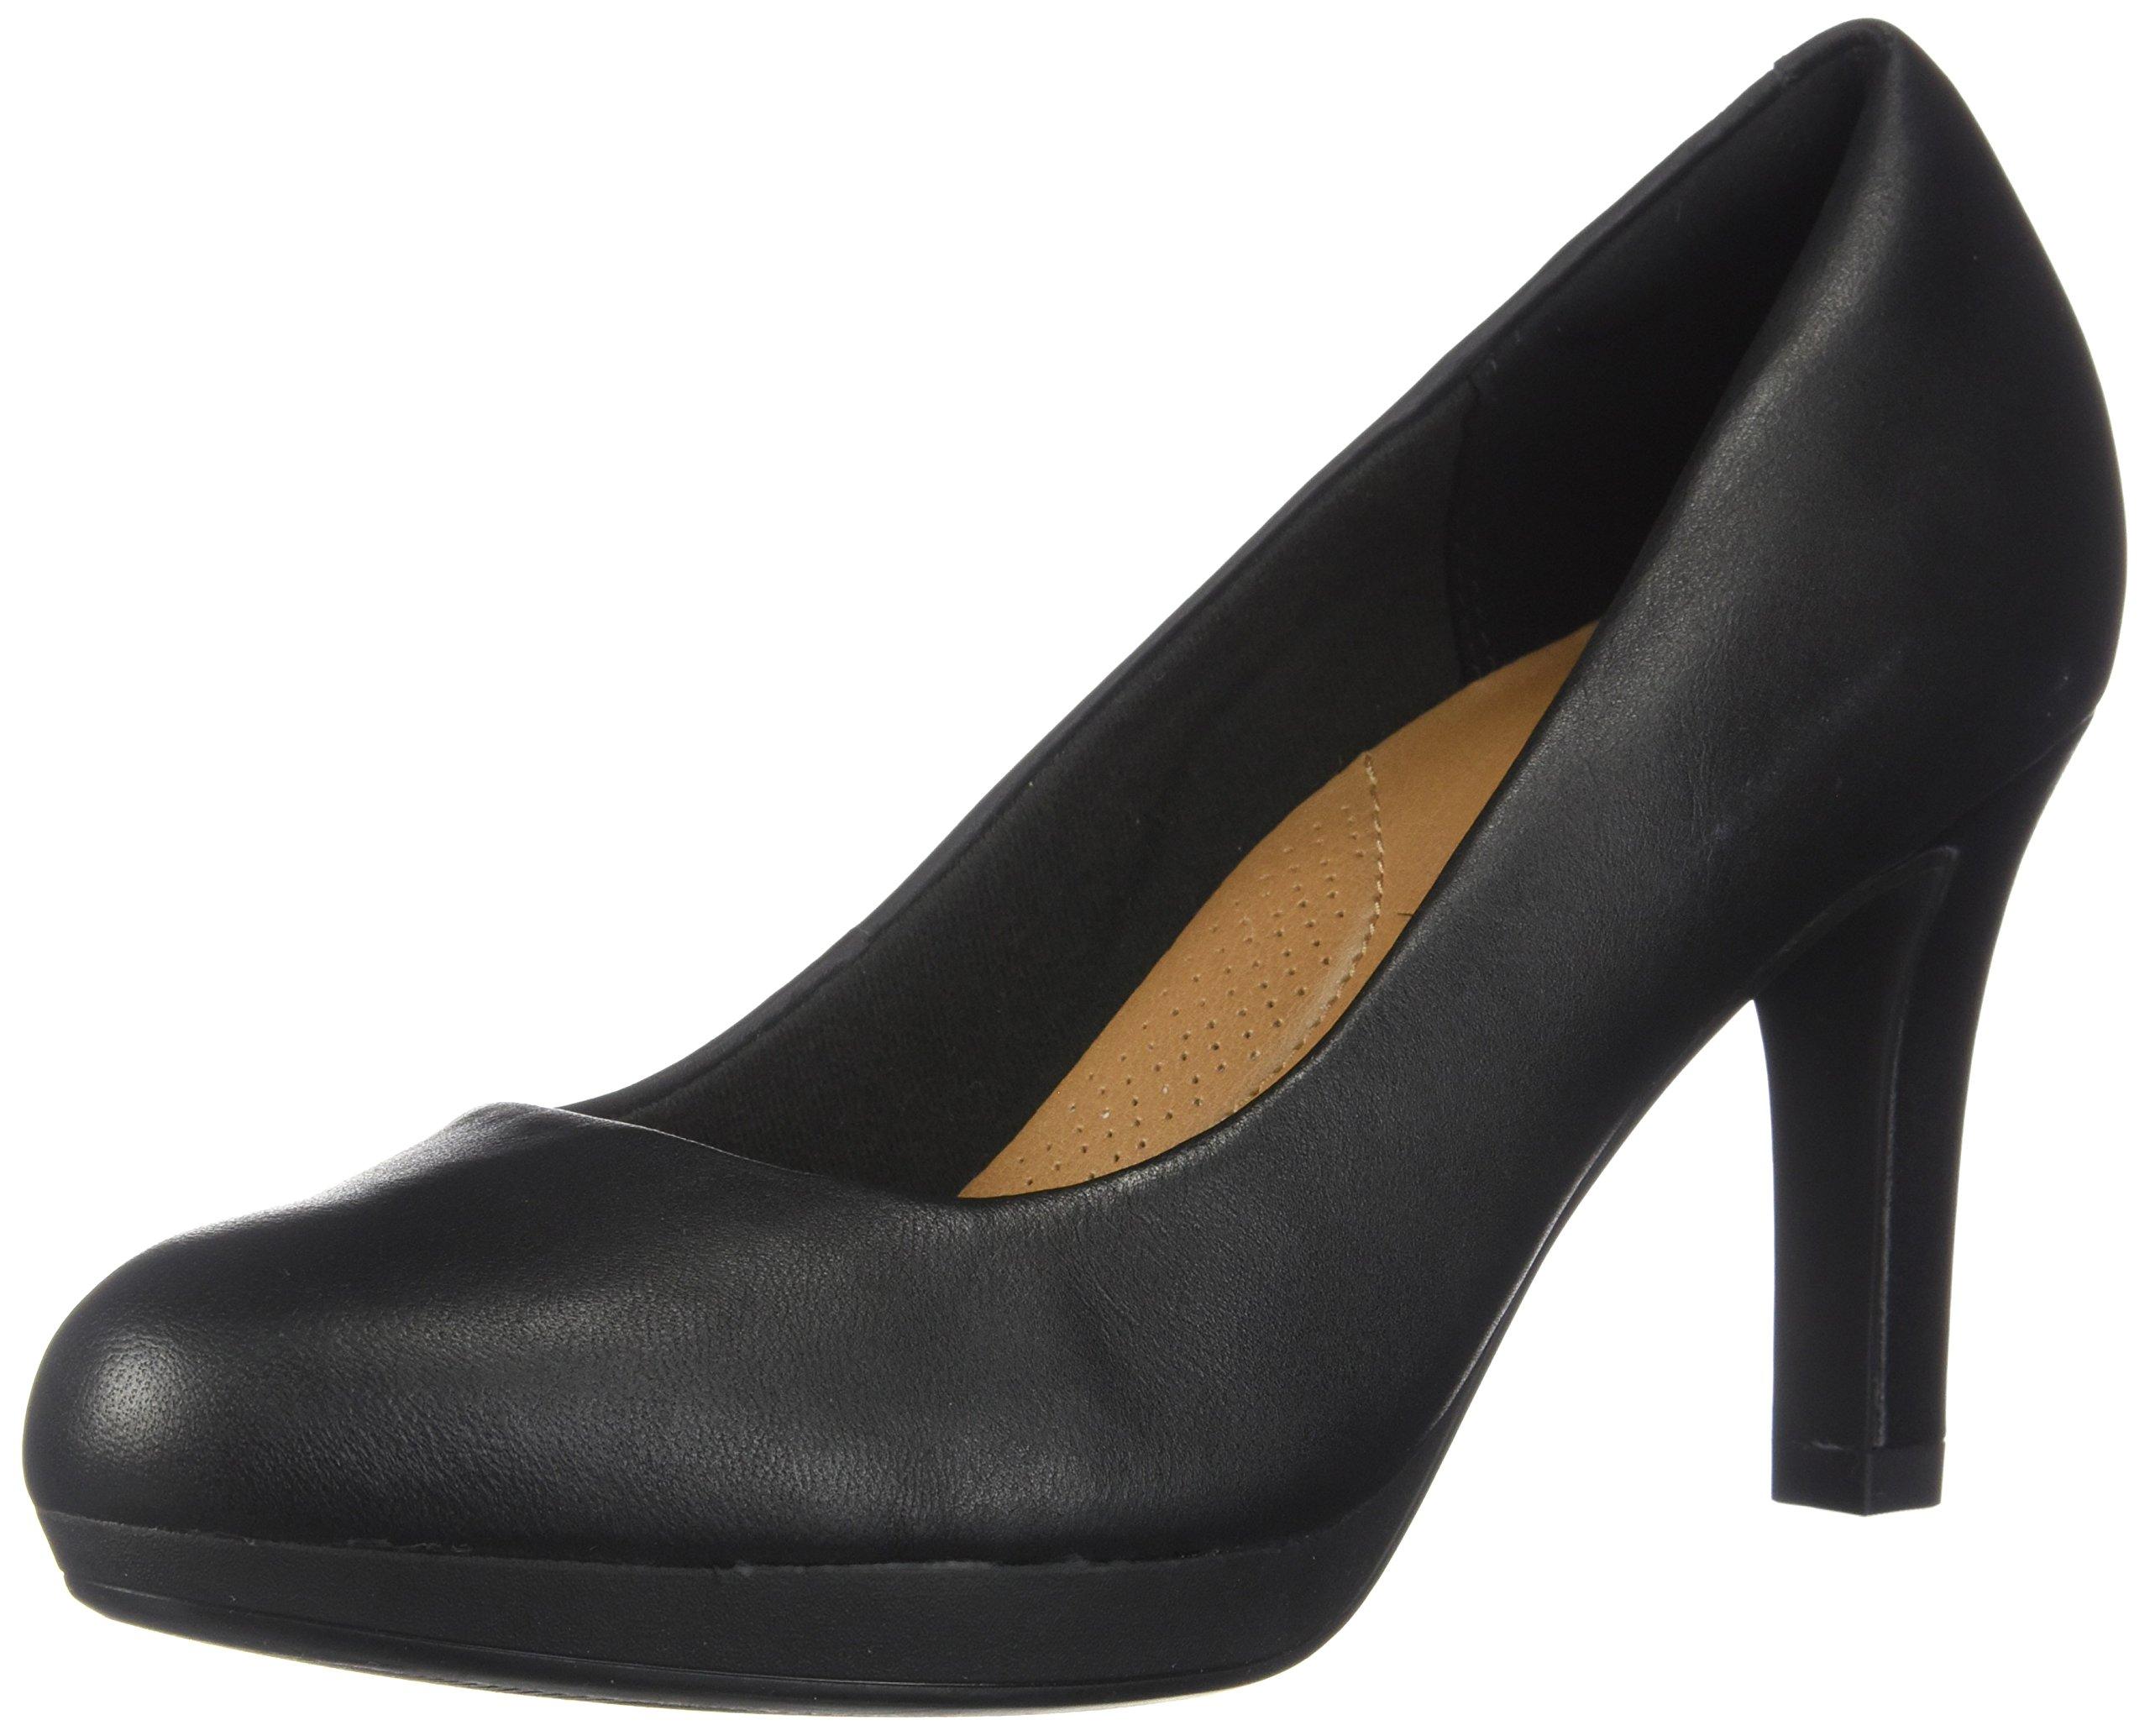 CLARKS Women's Adriel Viola Dress Pump, Black Leather, 9 M US